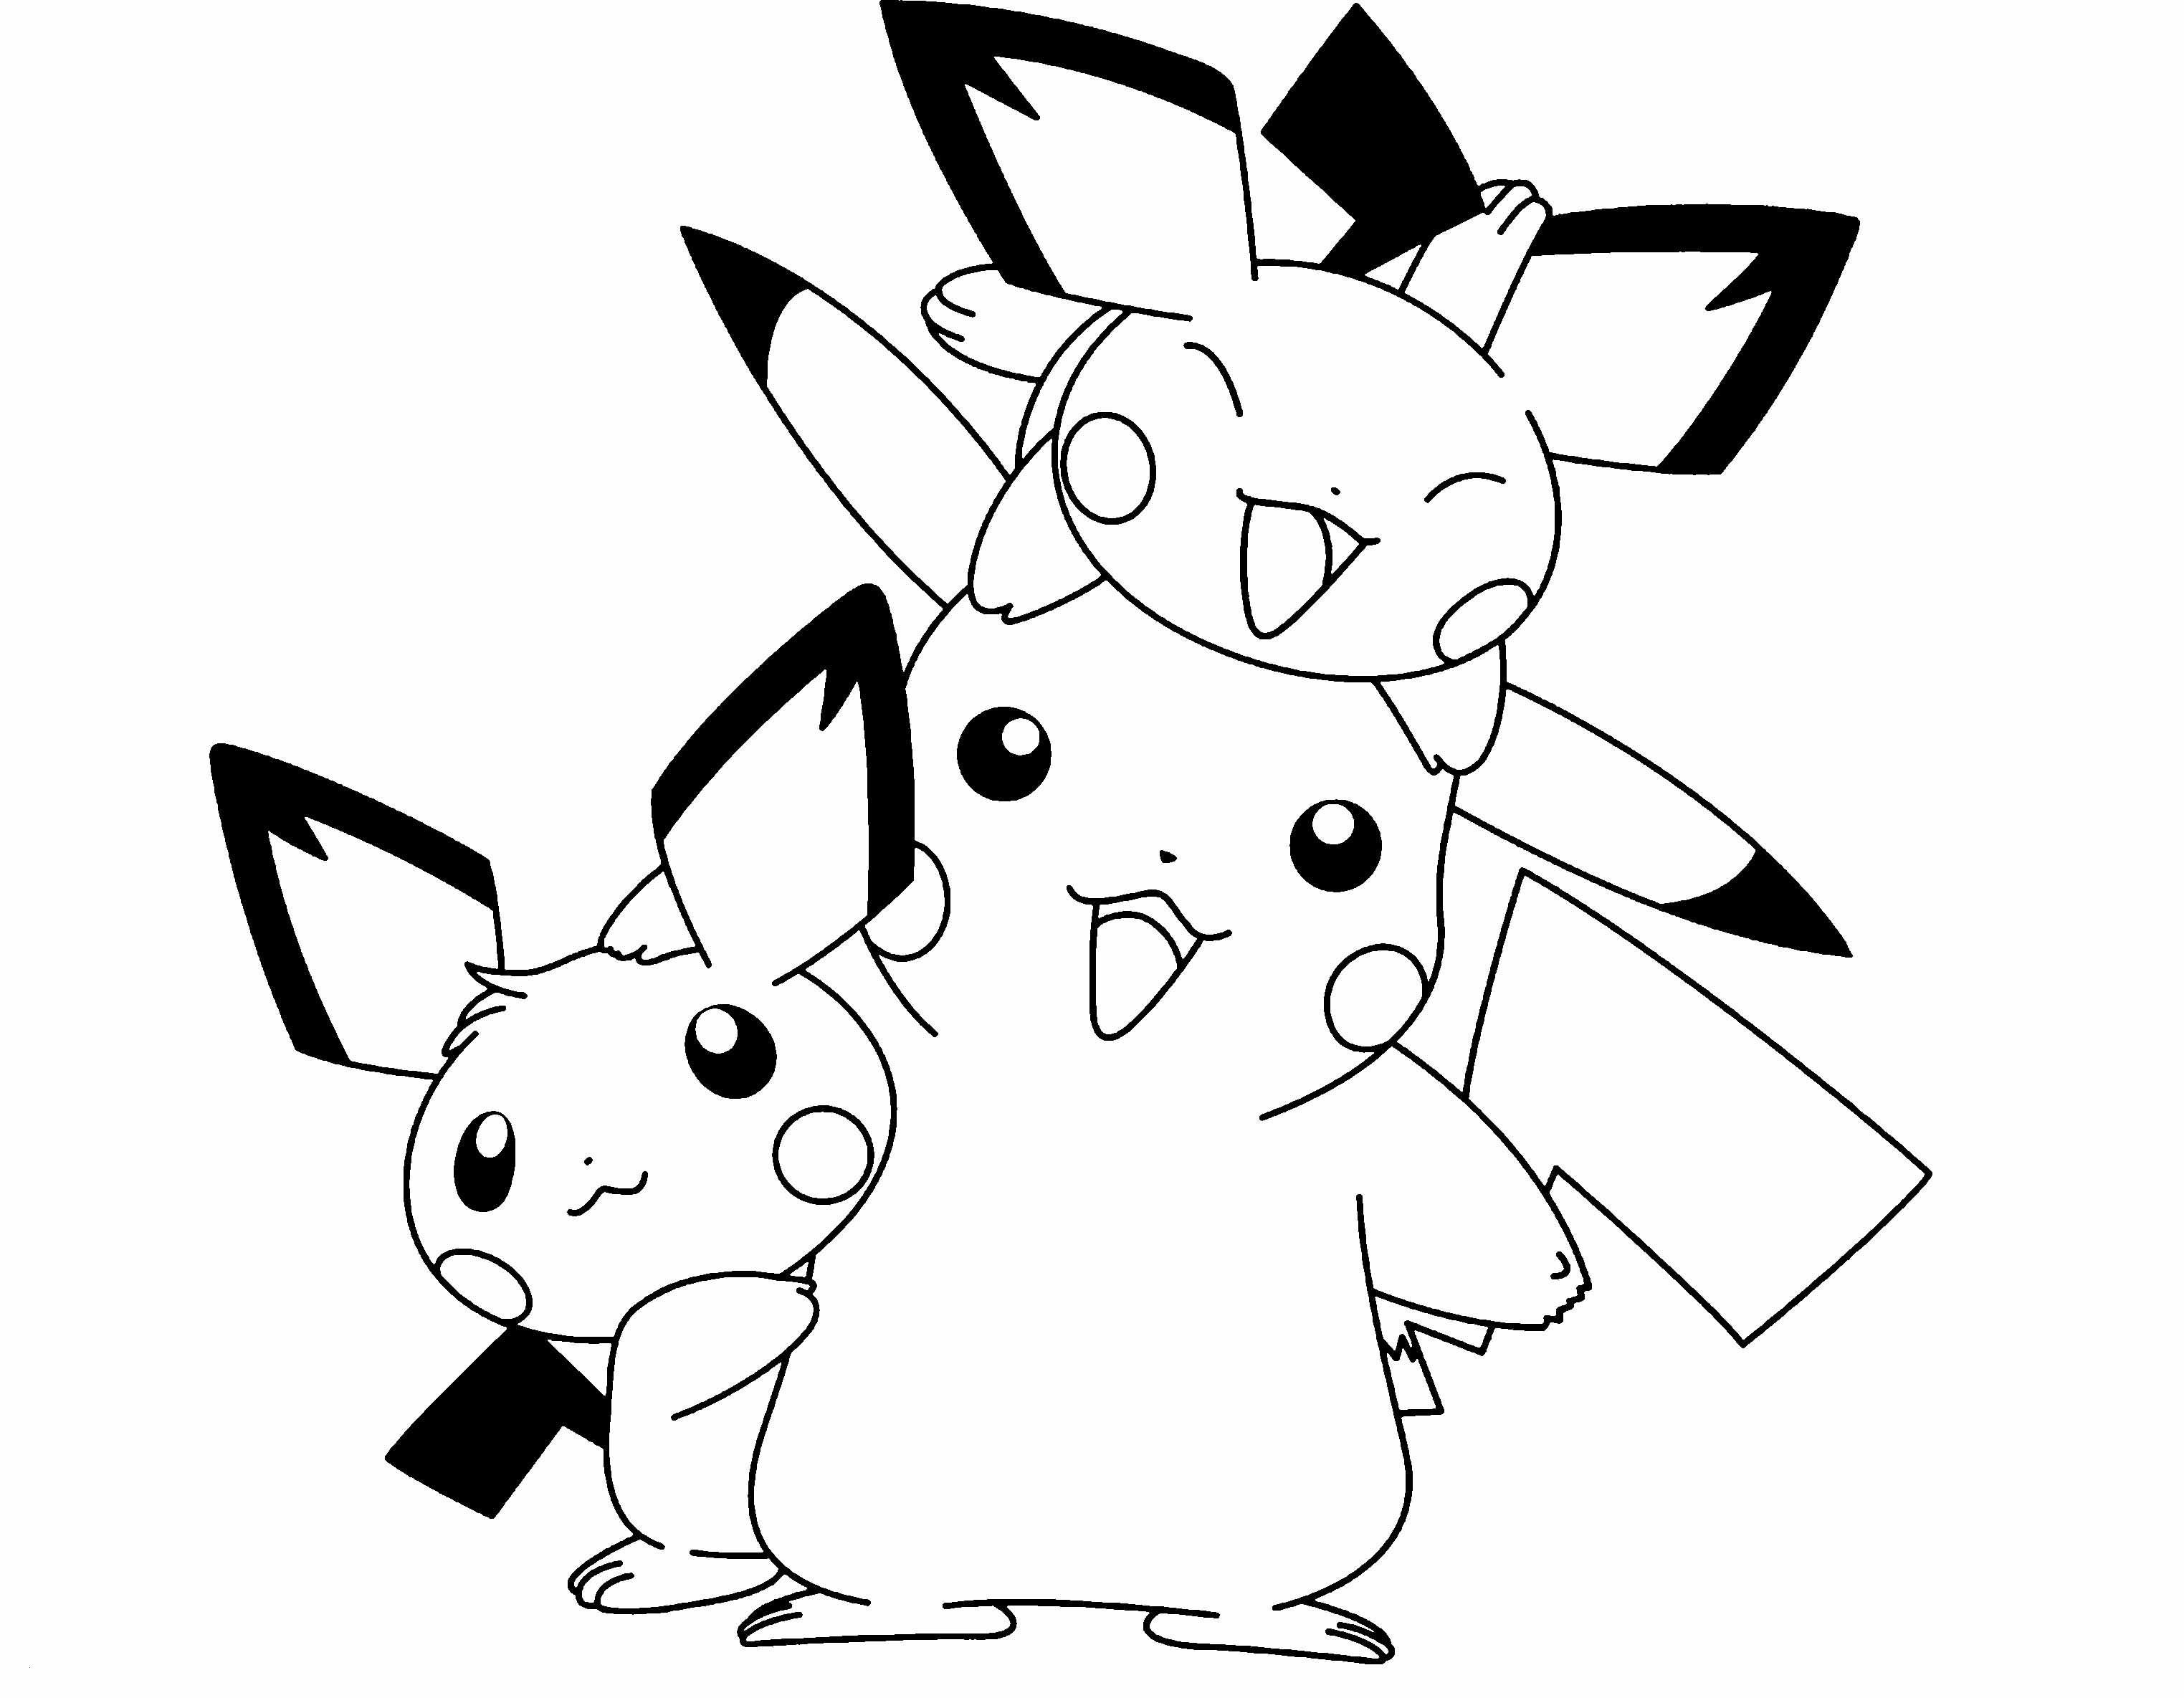 Ausmalbilder Pokemon Xy Genial 23 Pokemon Eevee Evolutions Coloring Pages Gallery Bild